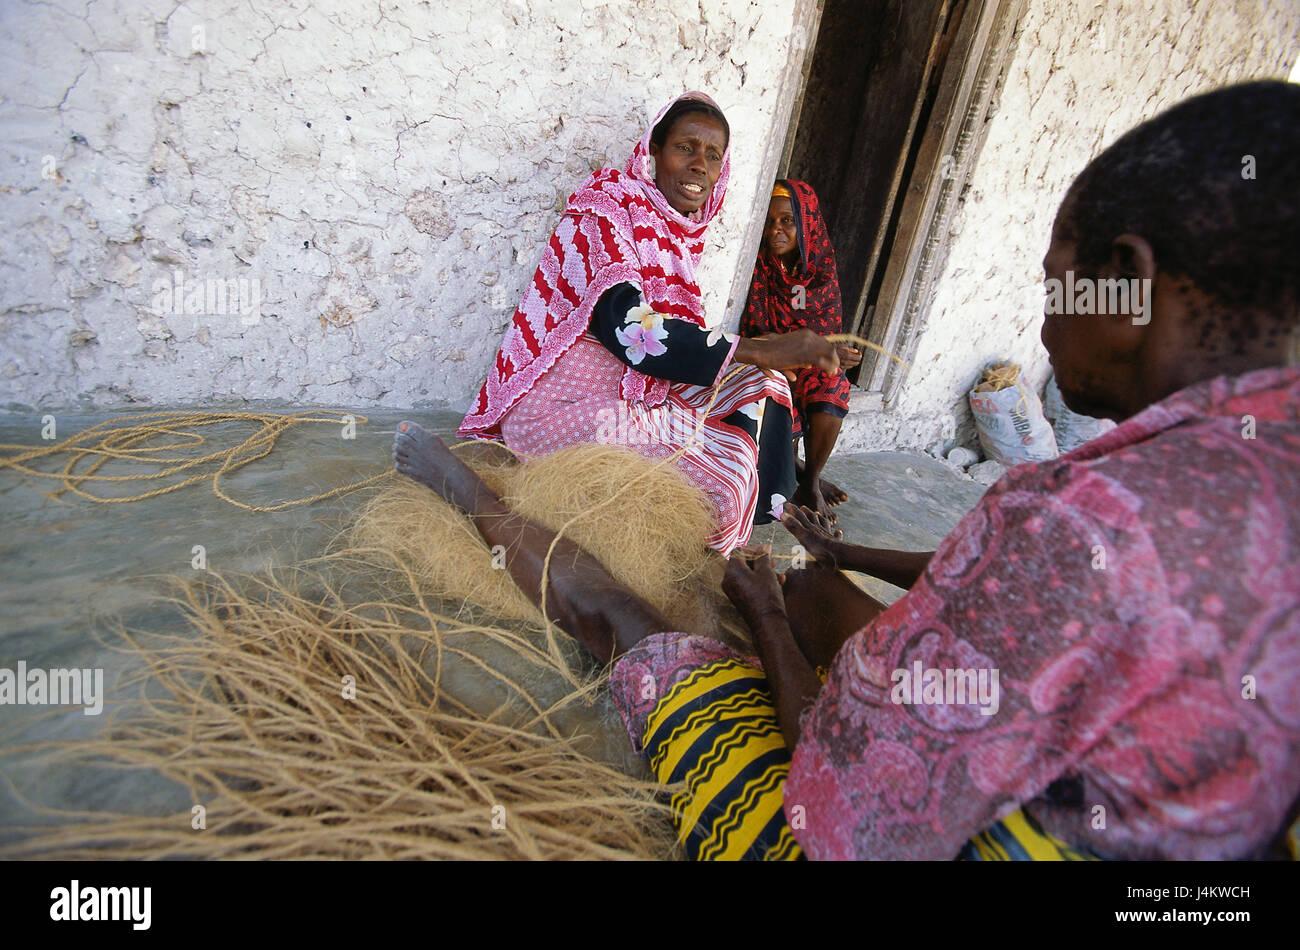 Tanzania, island Zanzibar, east coast, Bwejuu, women, coconut palm fibers, process, rope production, no model release - Stock Image